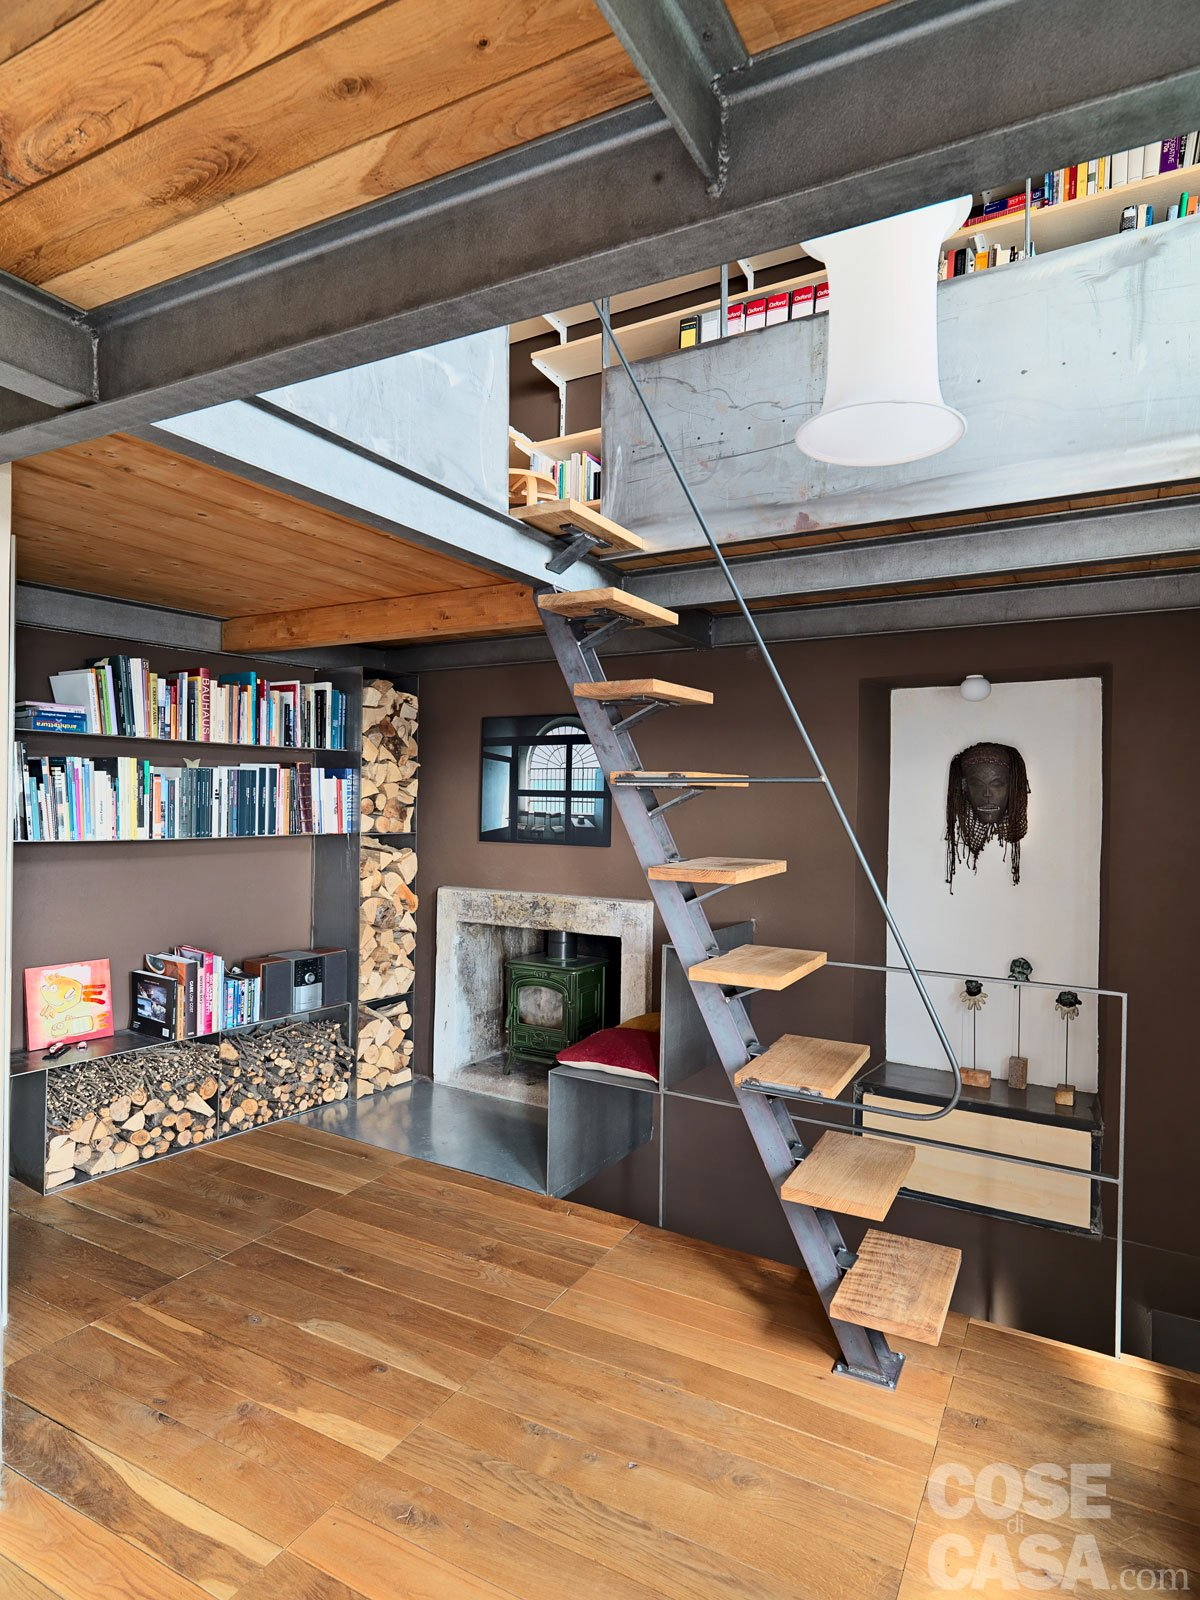 65 mq una casa che si sviluppa in verticale cose di casa. Black Bedroom Furniture Sets. Home Design Ideas